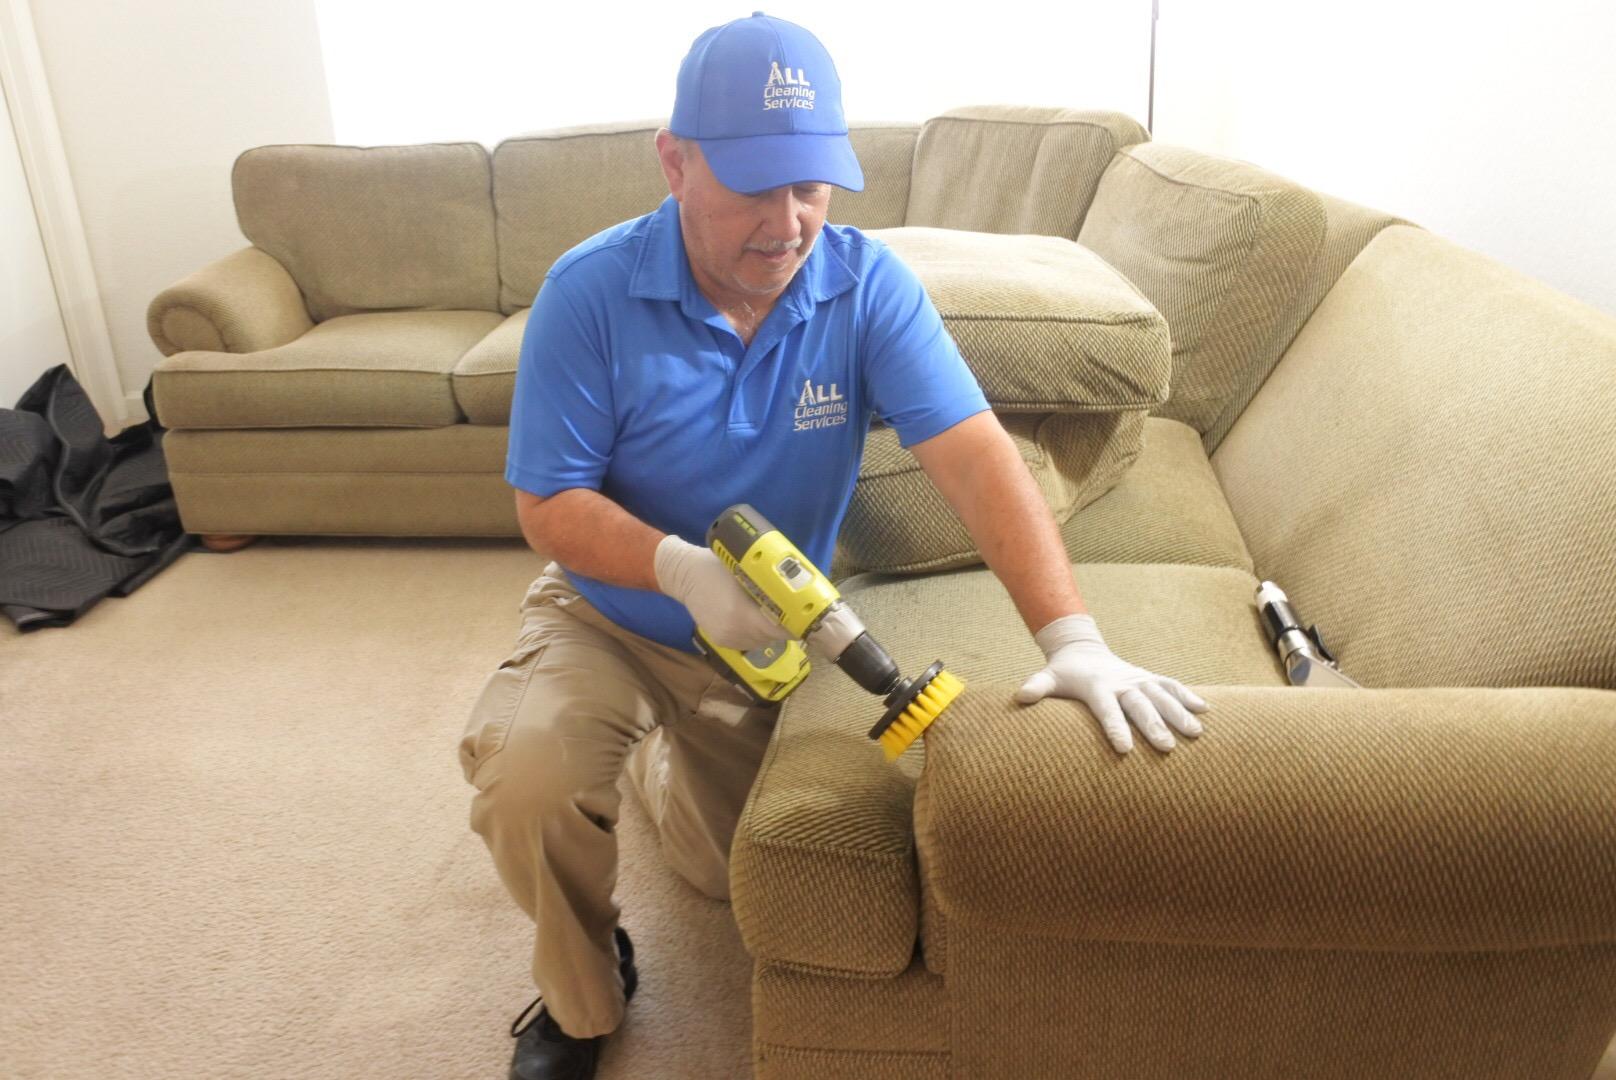 Upholstery Spot Cleaning in Jacksonville Fl